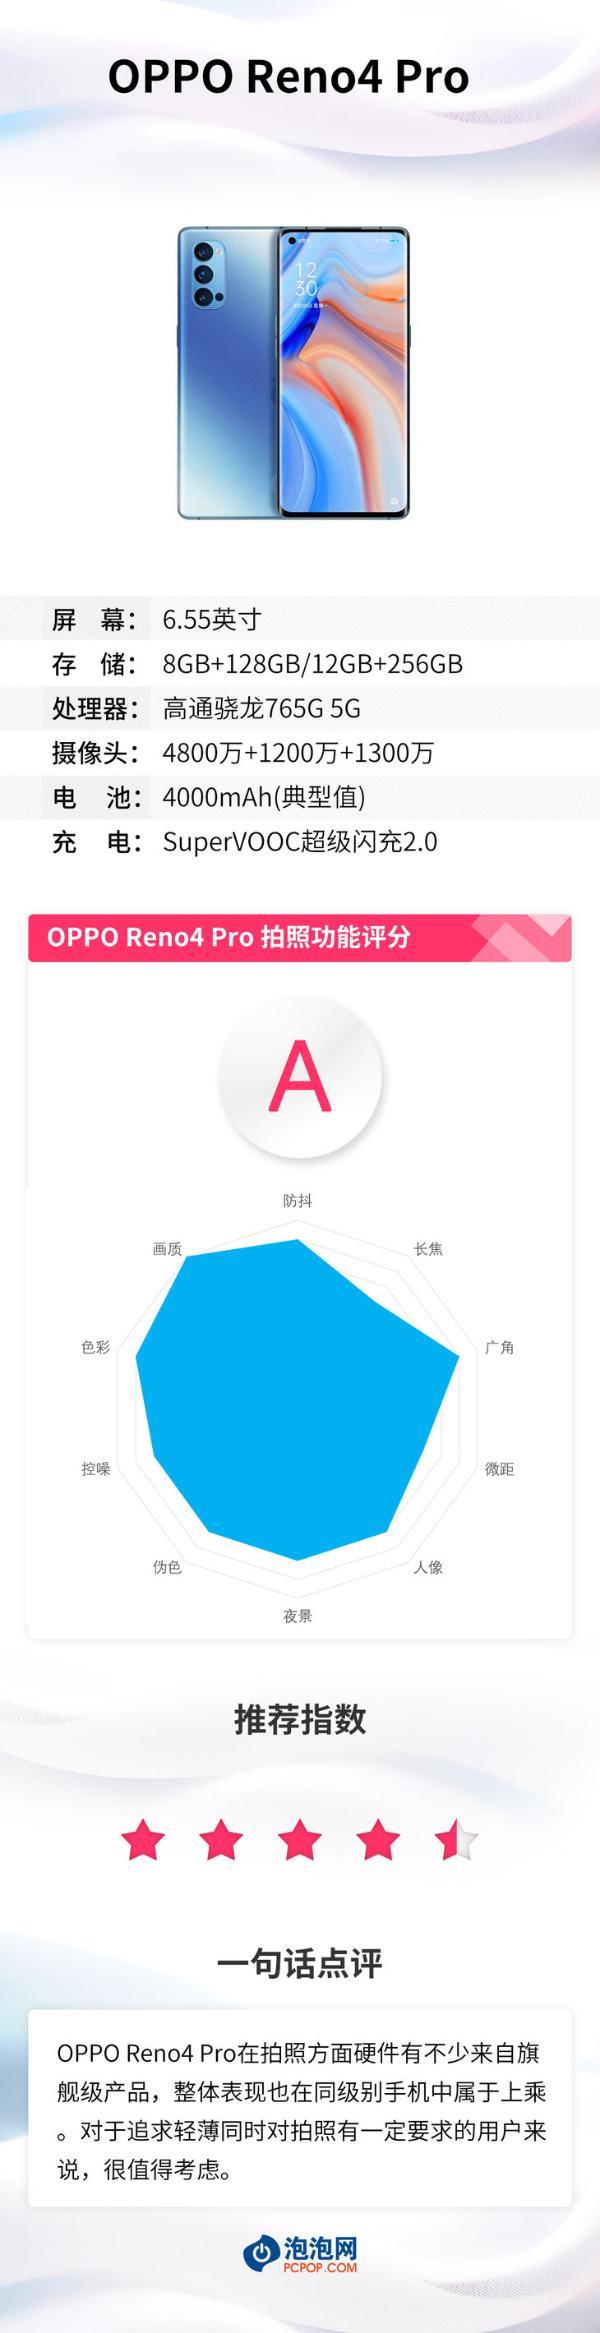 OPPO Reno4 Pro相机评分:媲美旗舰的画质